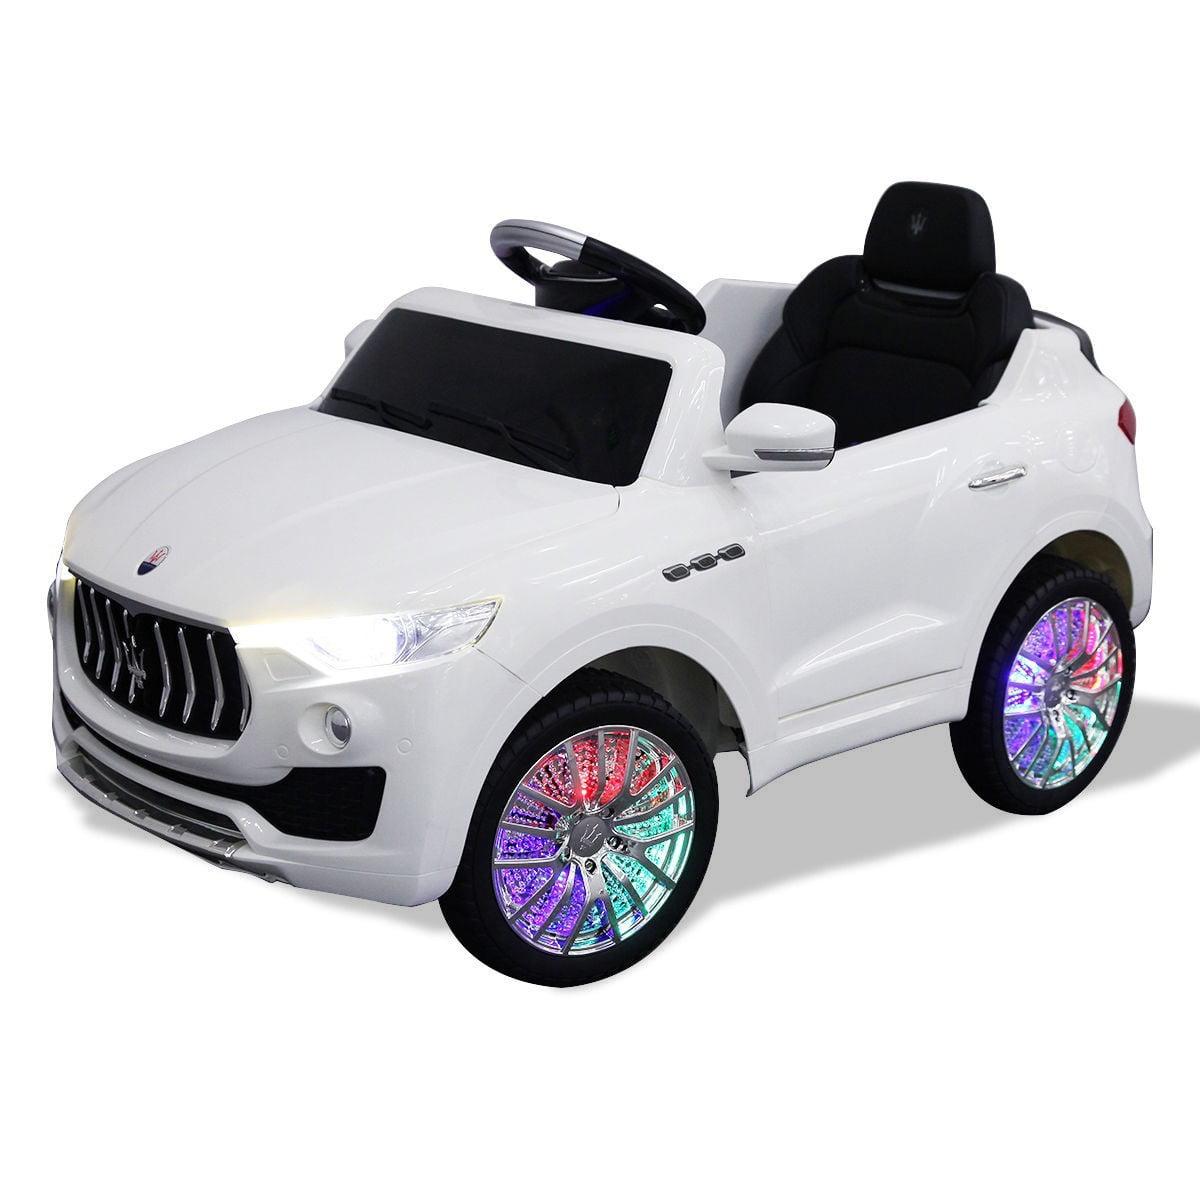 6 V Licensed Maserati Kids Ride on Car - Blue